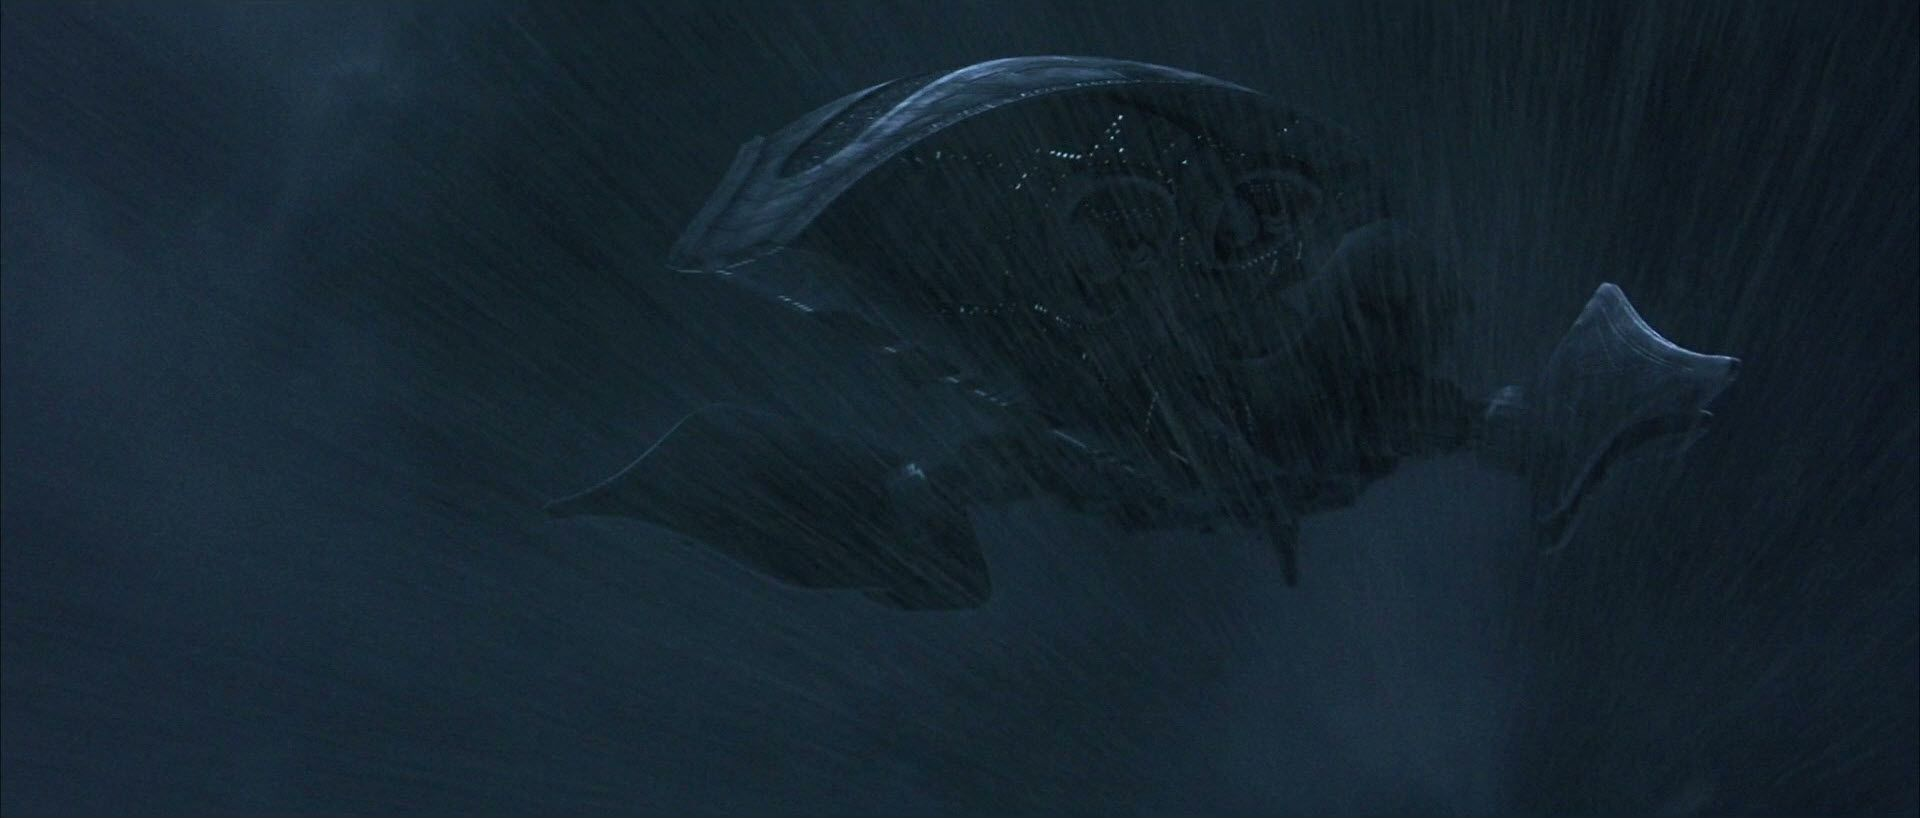 Hostile Database: Remnant Dreadnought 3c5c4cad653eb6b3eeacba1aba2b9f2f